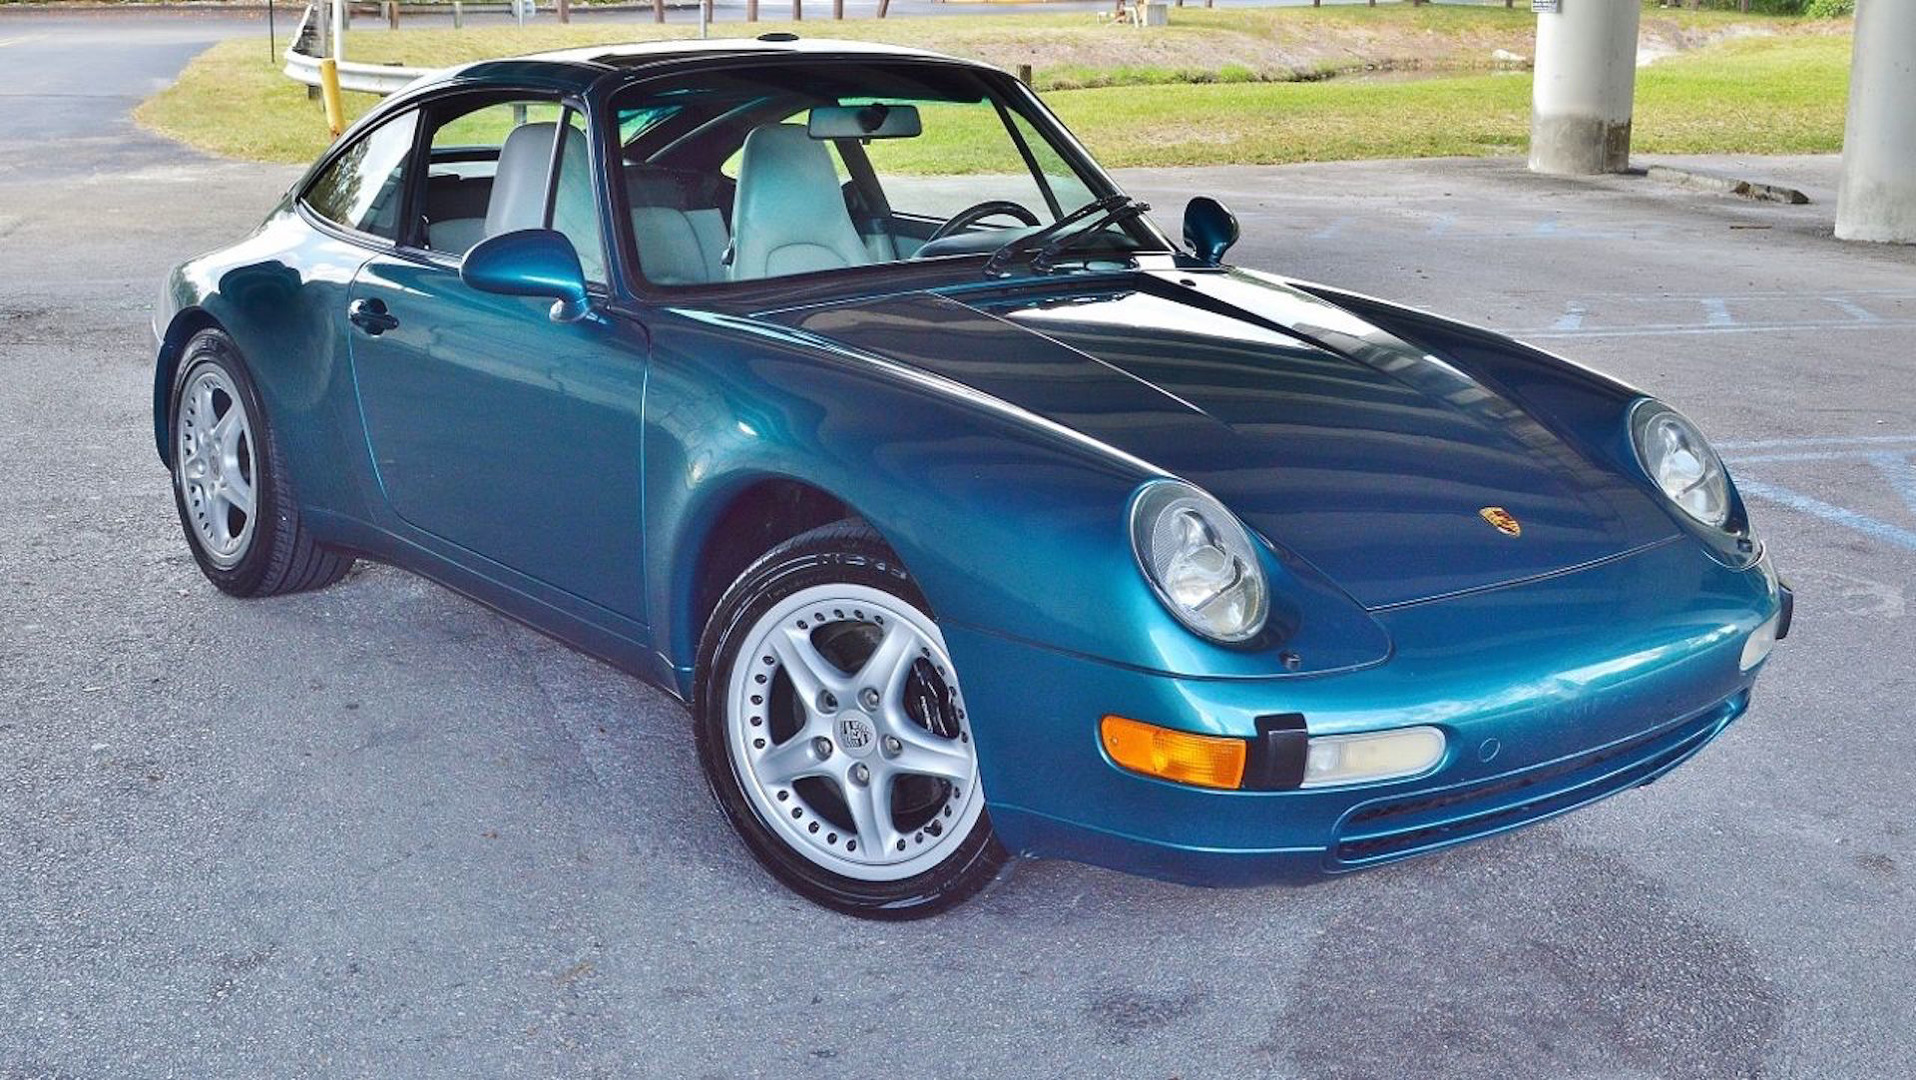 Teal Porsche 993 Targa eBay Find Is Pure '90s Nostalgia